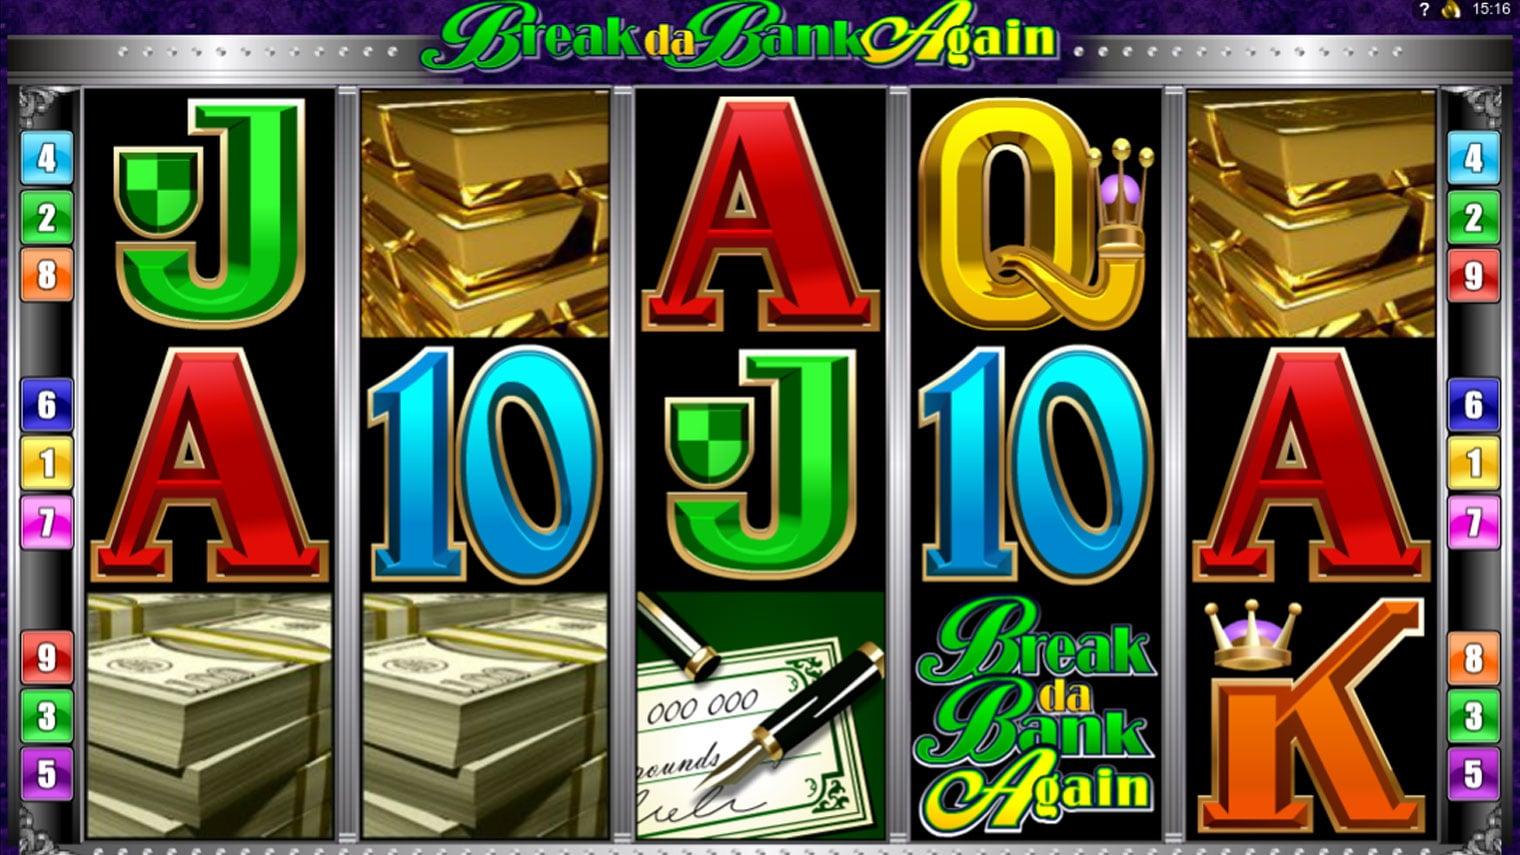 Break da Bank Again Slot Machine - How to Play